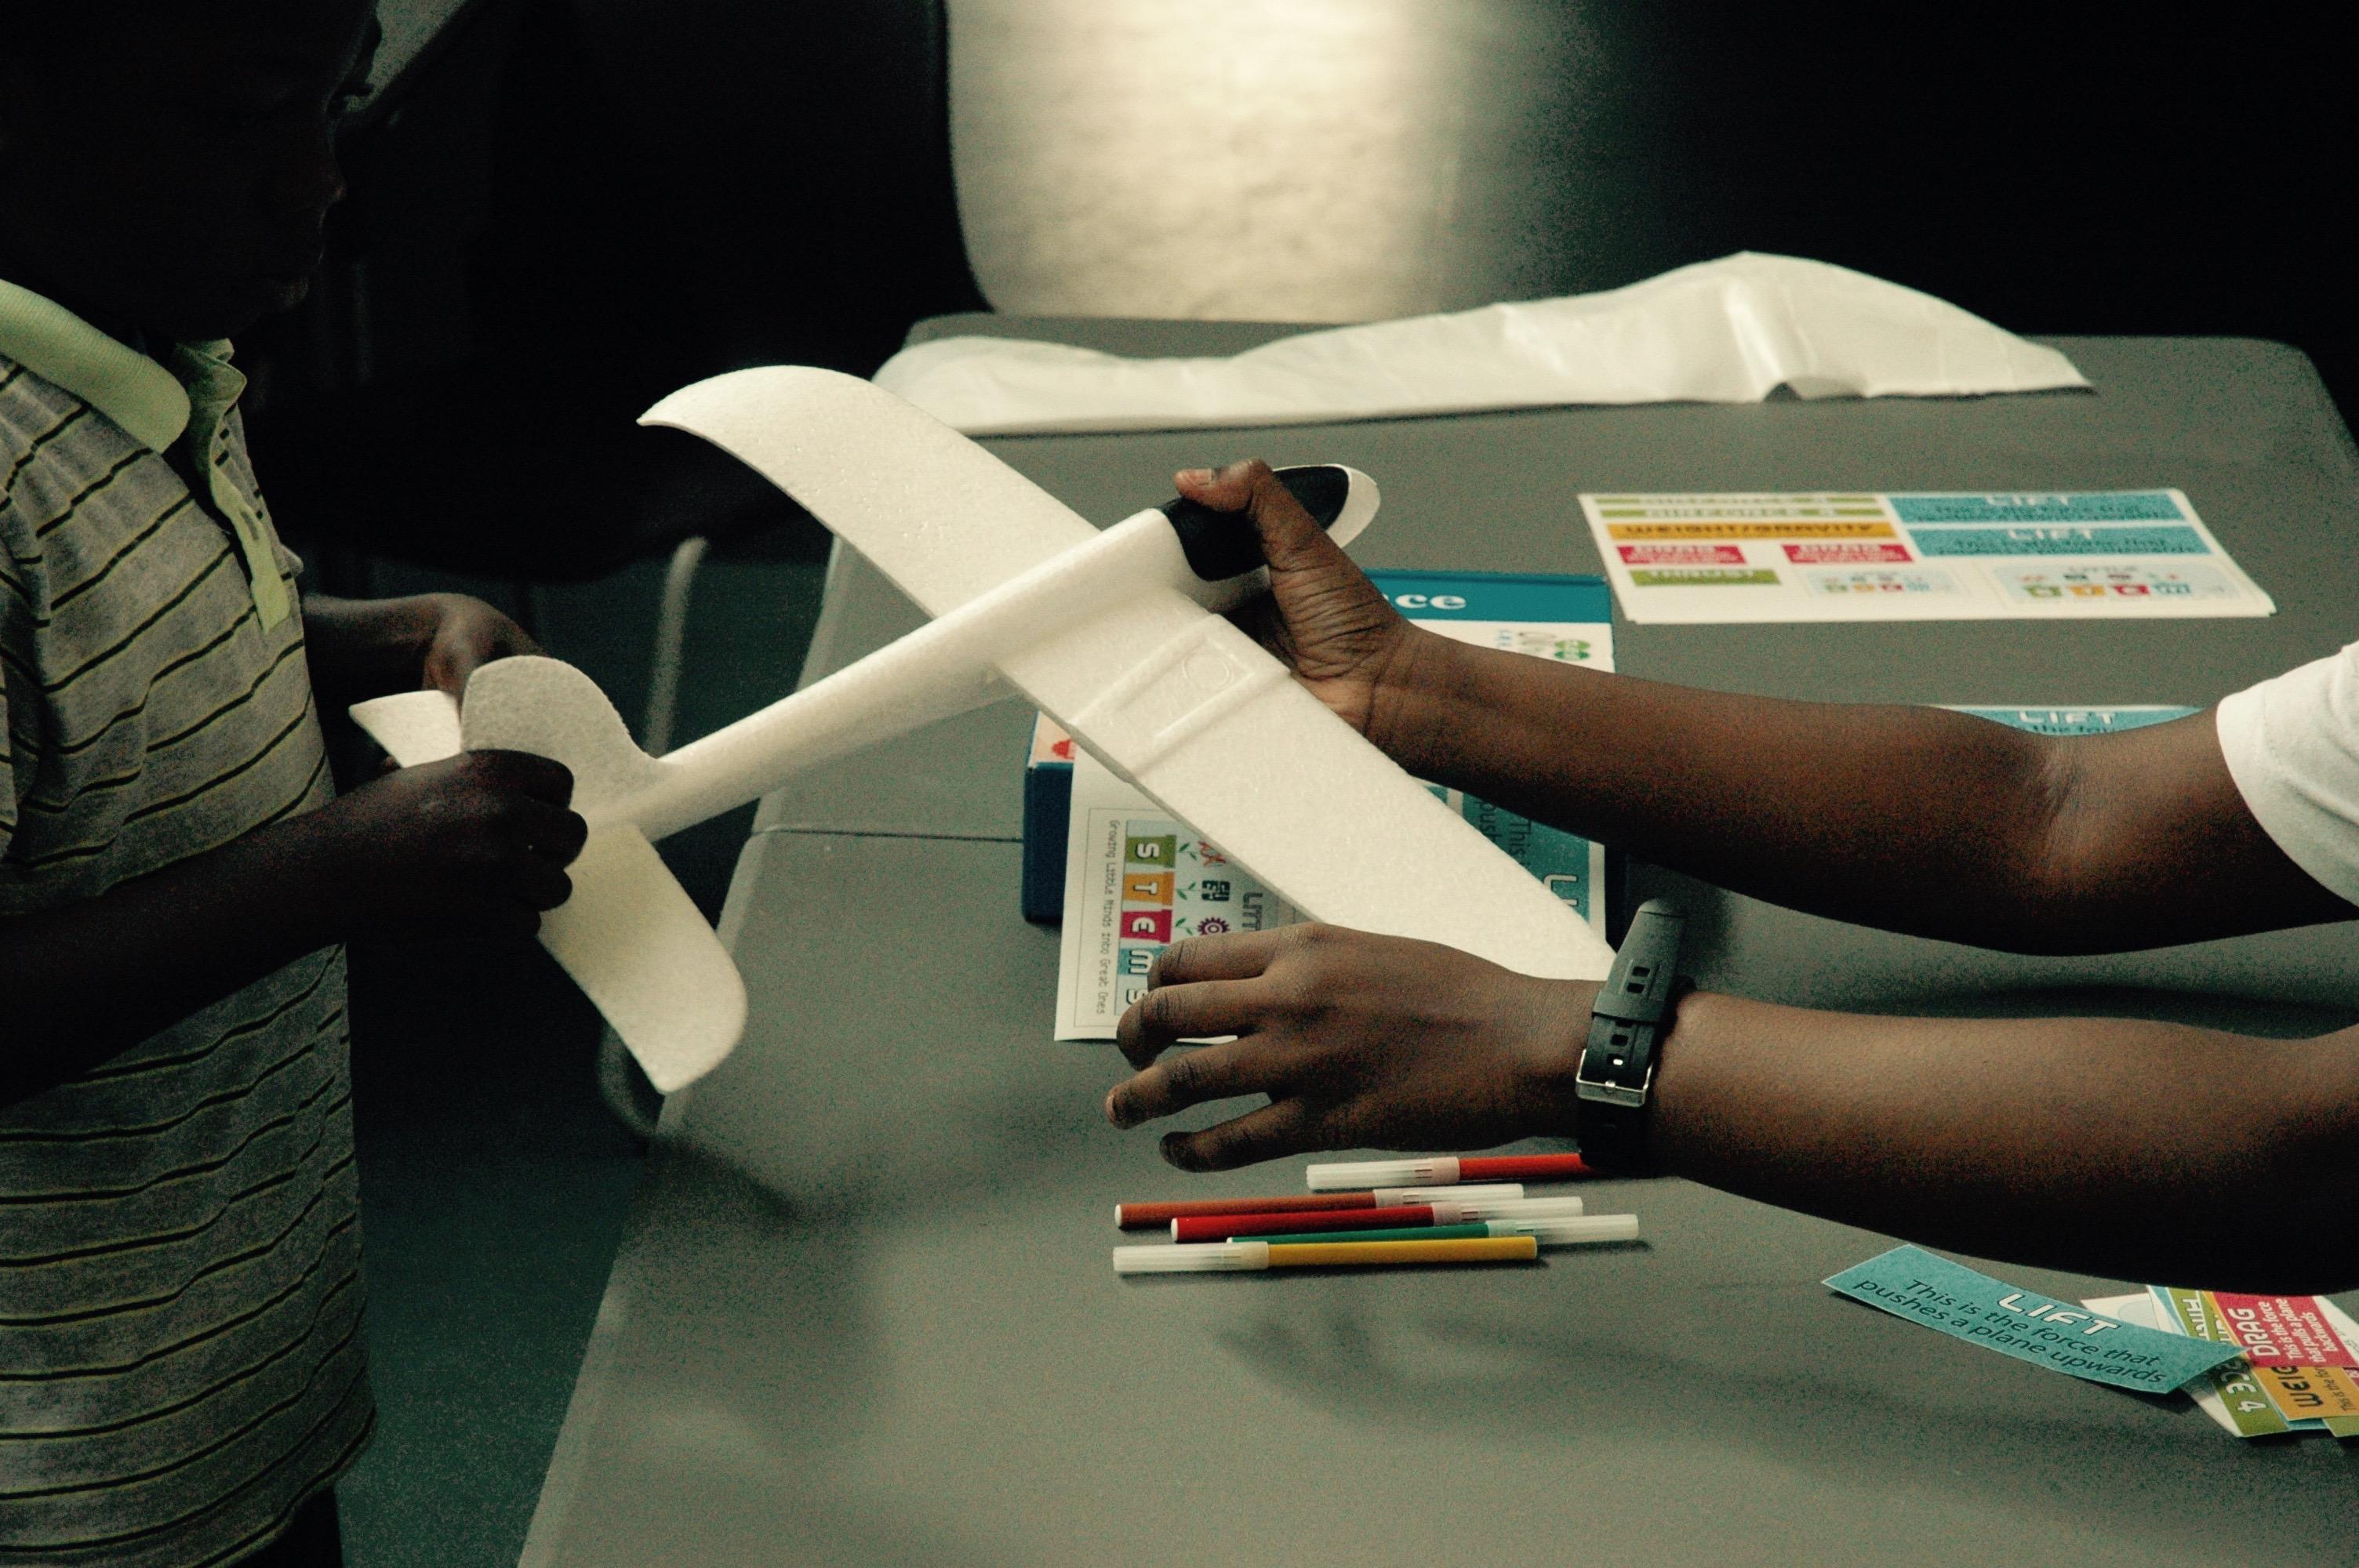 EPP Plane